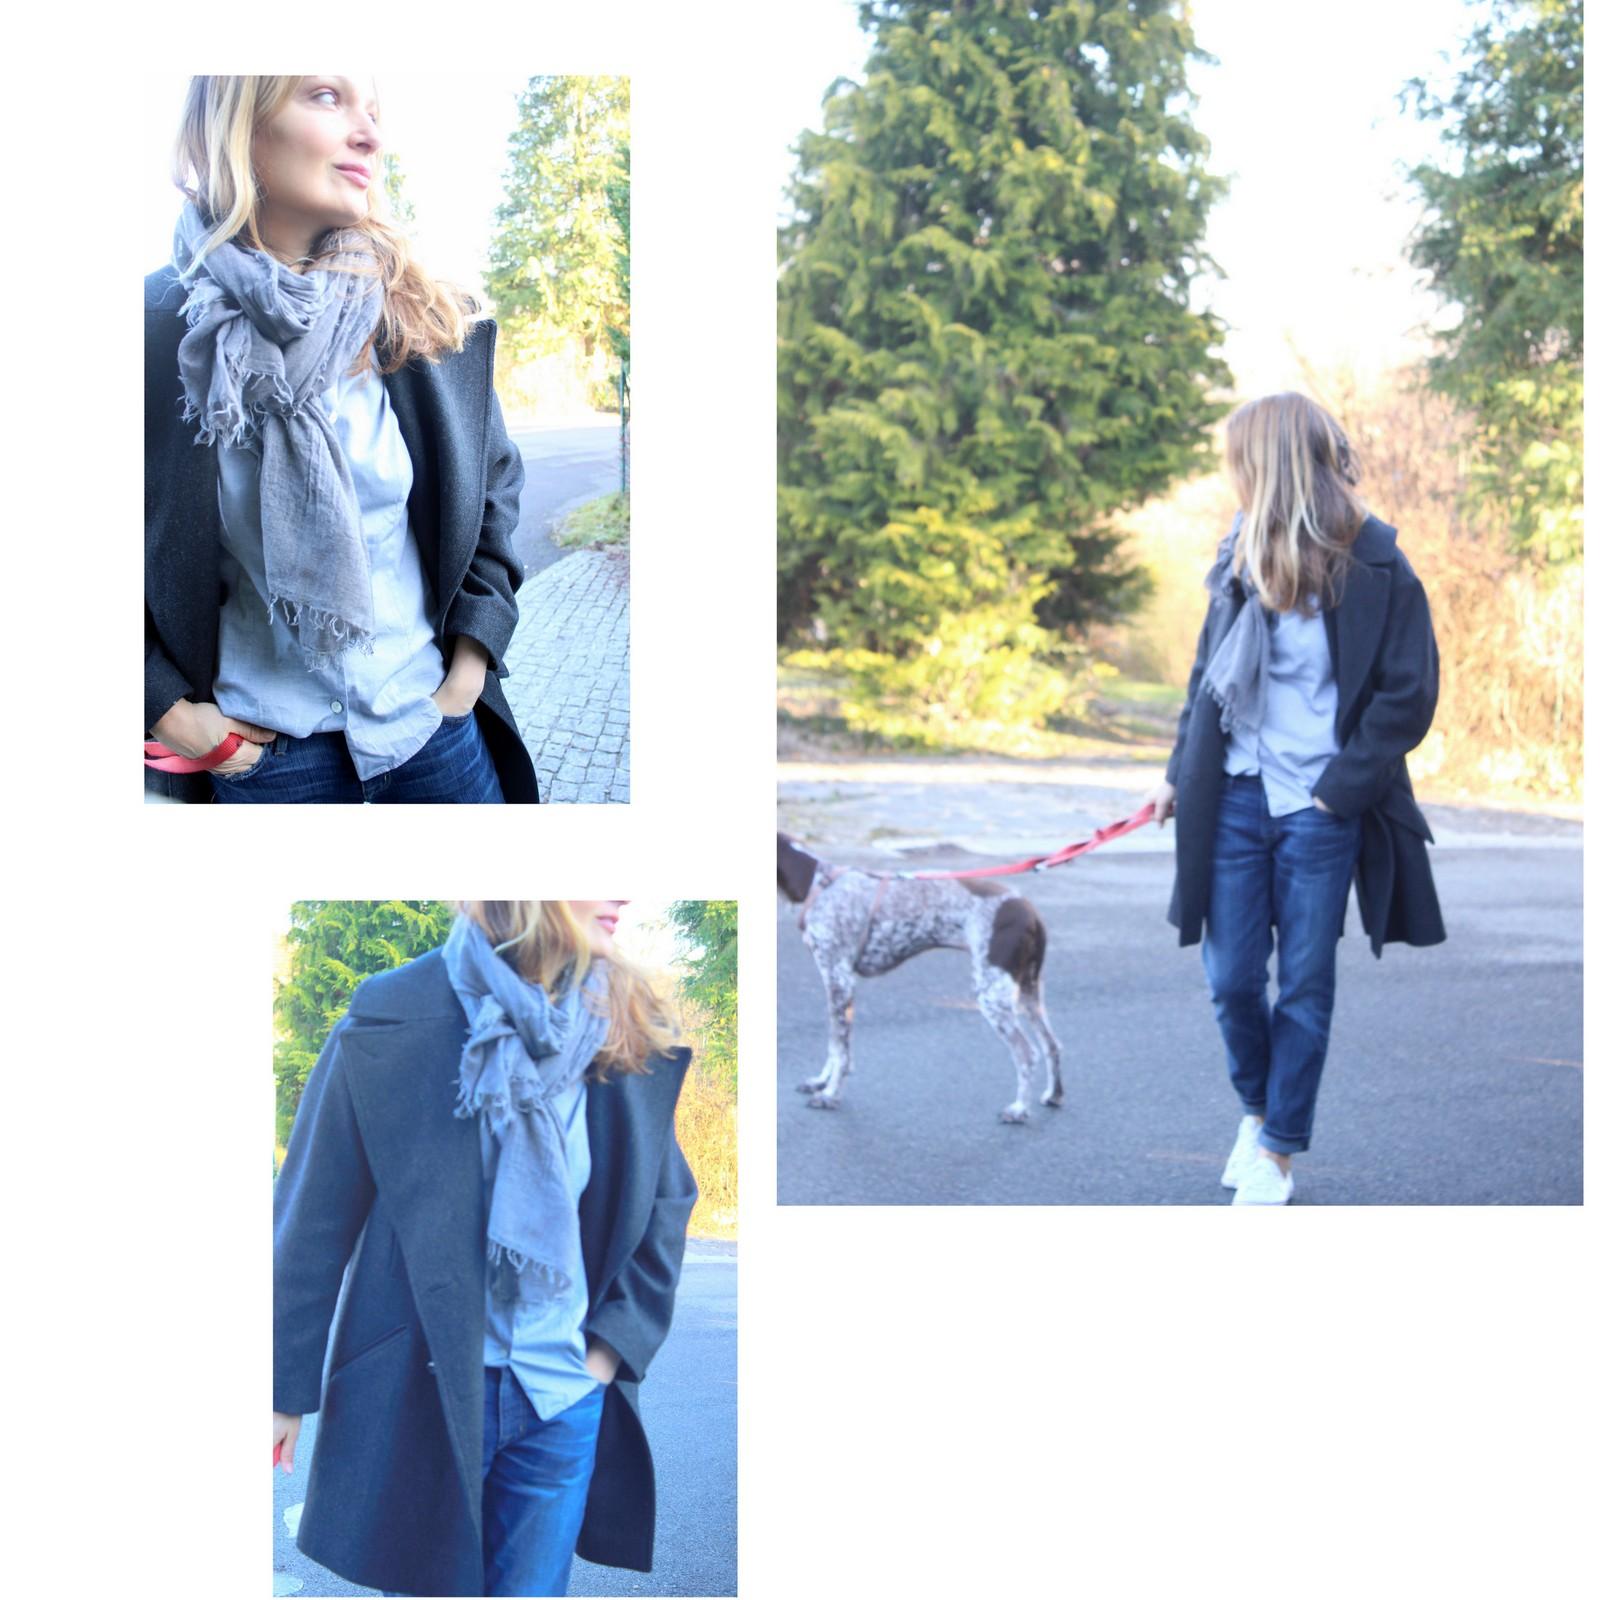 Capsule wardrobe Isabel Marant coat